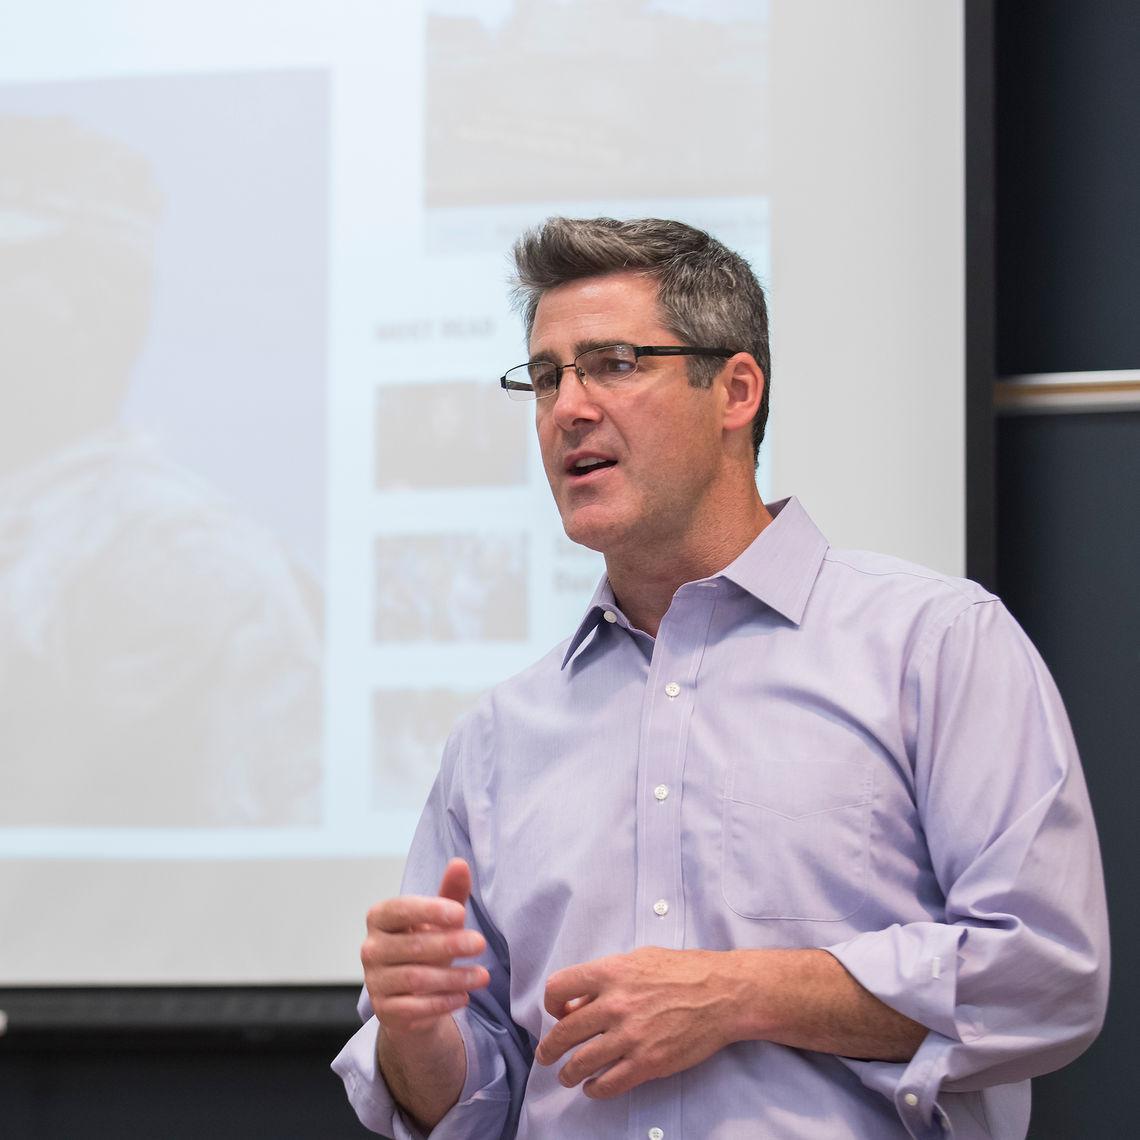 Bryan Stinchfield speaks during Alumni Weekend 2018